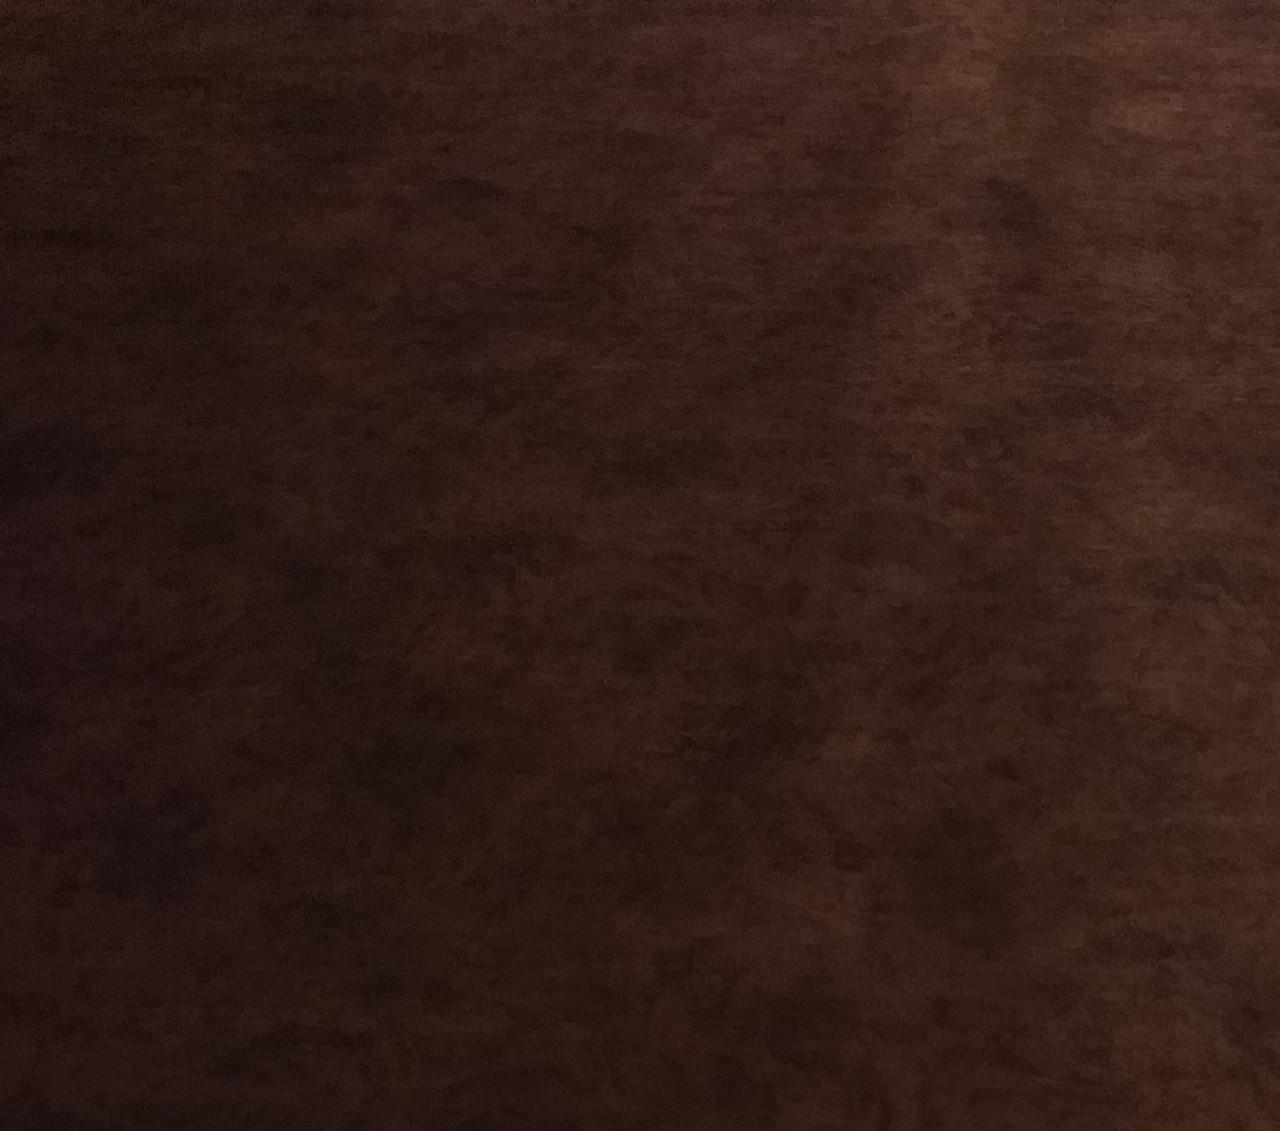 Обивочная влагоотталкивающая ткань Мазерати 05 браун (MASERATI 05 BROWN)